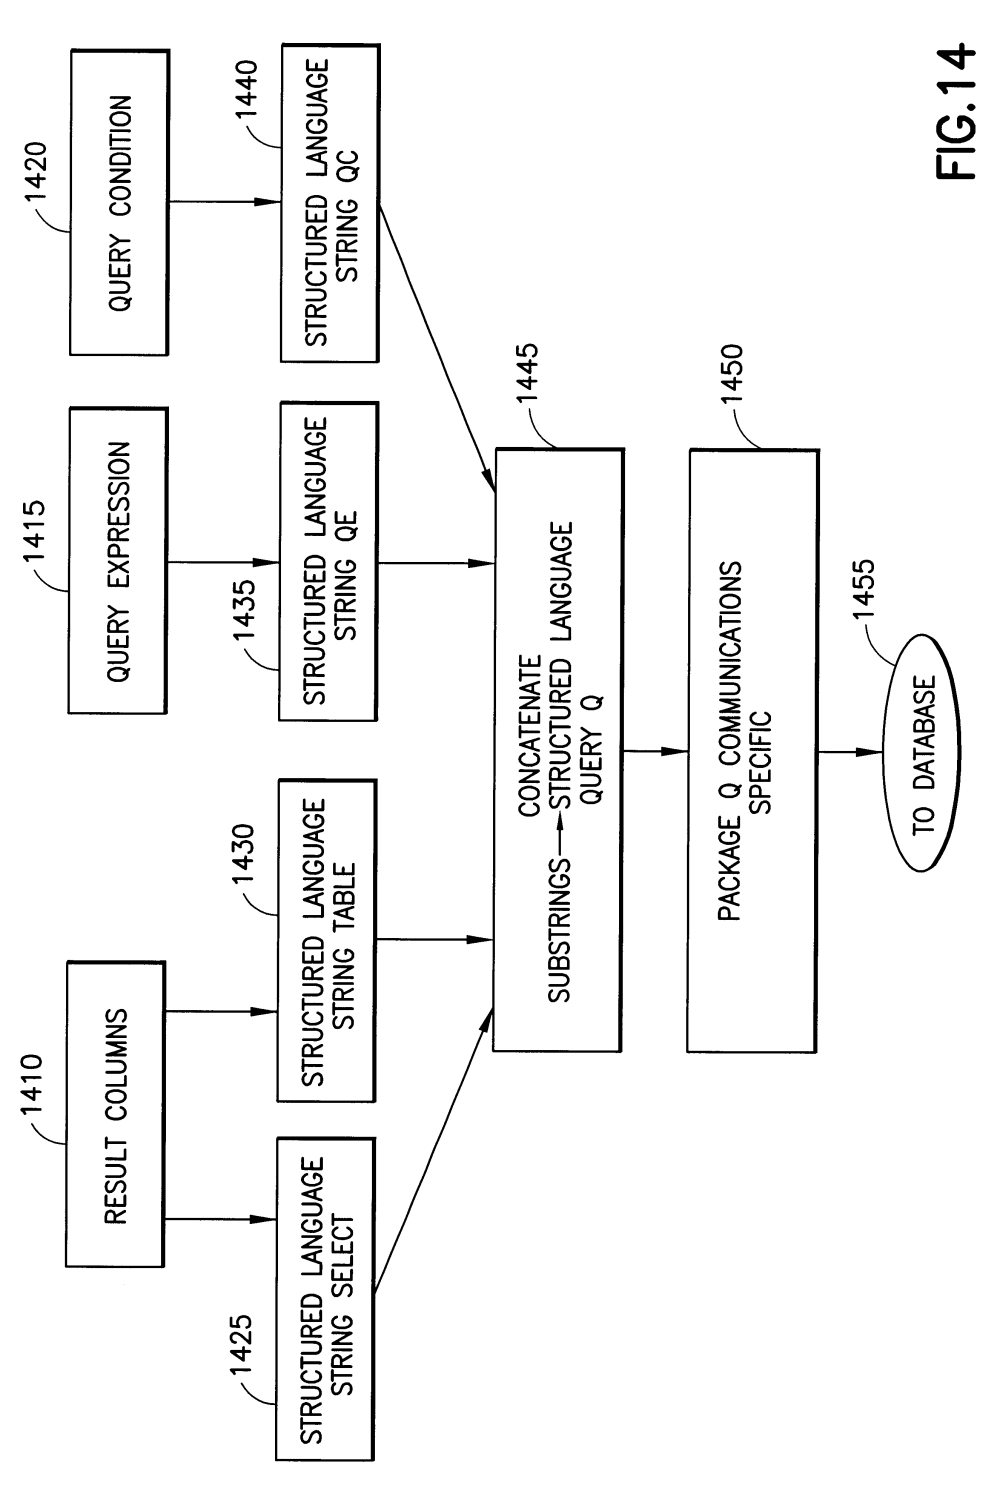 medium resolution of honda 250ex wiring diagram trusted wiring diagram trx 300ex wiring diagram honda 300ex engine wiring diagram